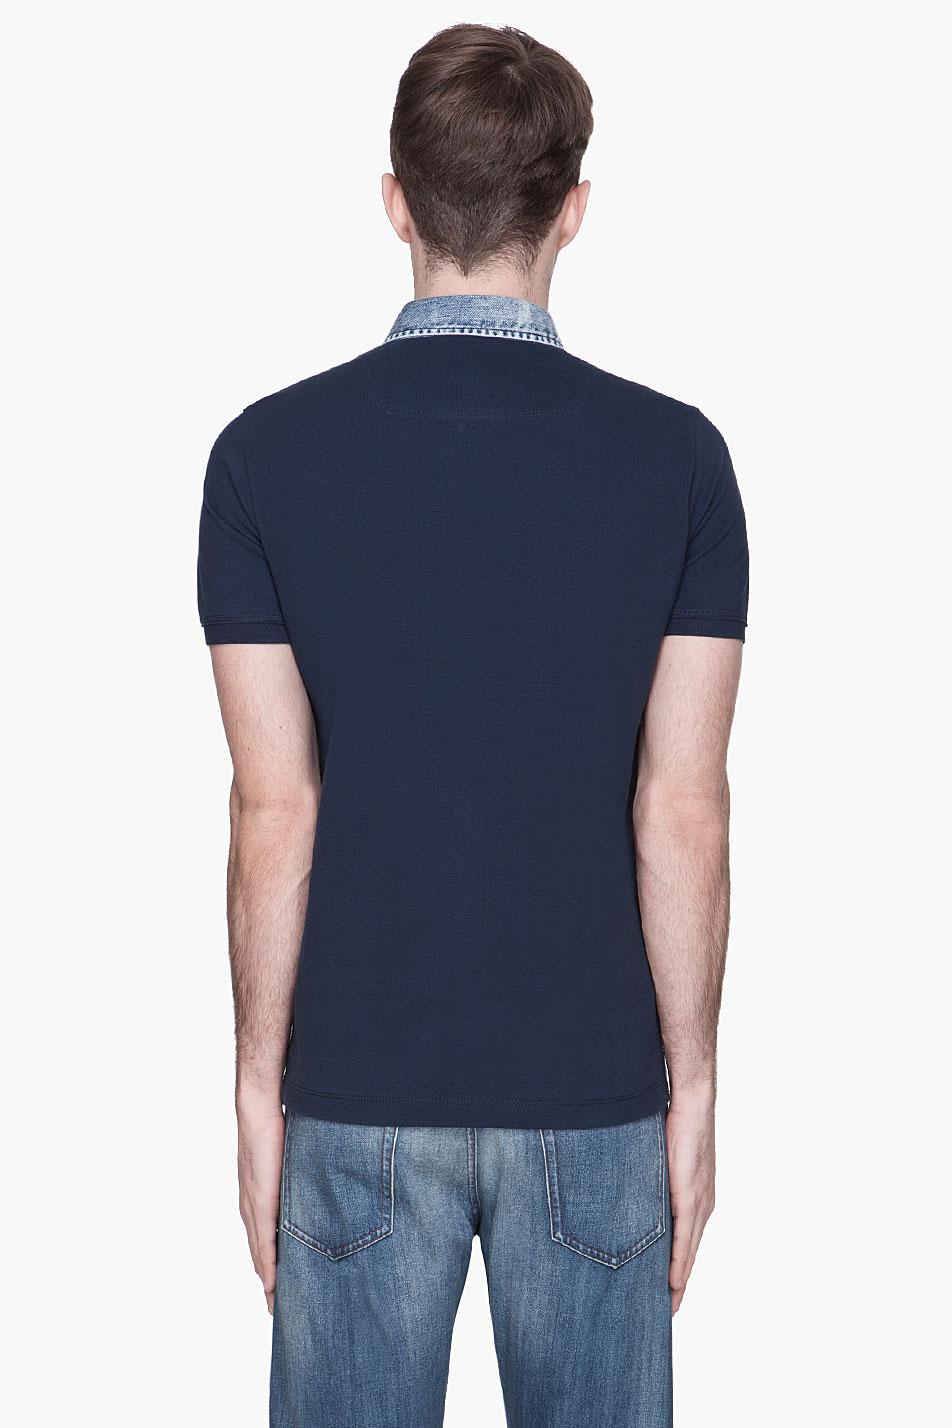 Wrangler Workwear (Price/Pcs)Wrangler Workwear SD10MS Long Sleeve Wrangler Denim Shirt - Blue. Sold by Bidlessnow. $ $ Ralph Lauren Mens Denim Work Button Up Shirt. Sold by Tags Weekly. $ - $ $ - $ Port & Company SP10 Men's % Cotton Long Sleeve Value Denim Shirt.